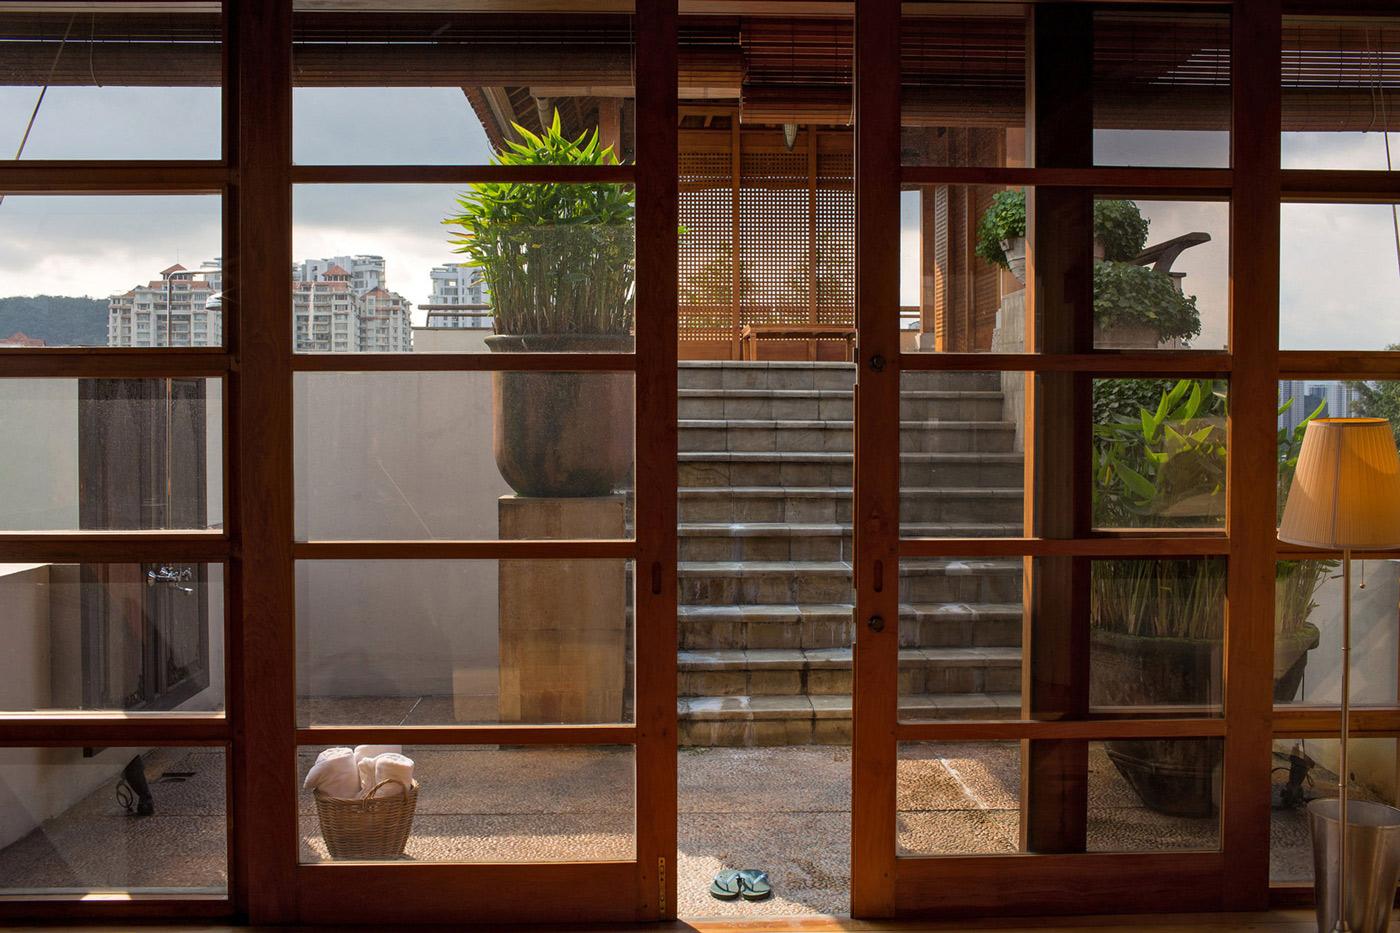 Courtyard, Glass Sliding Doors, Home in Kuala Lumpur, Malaysia